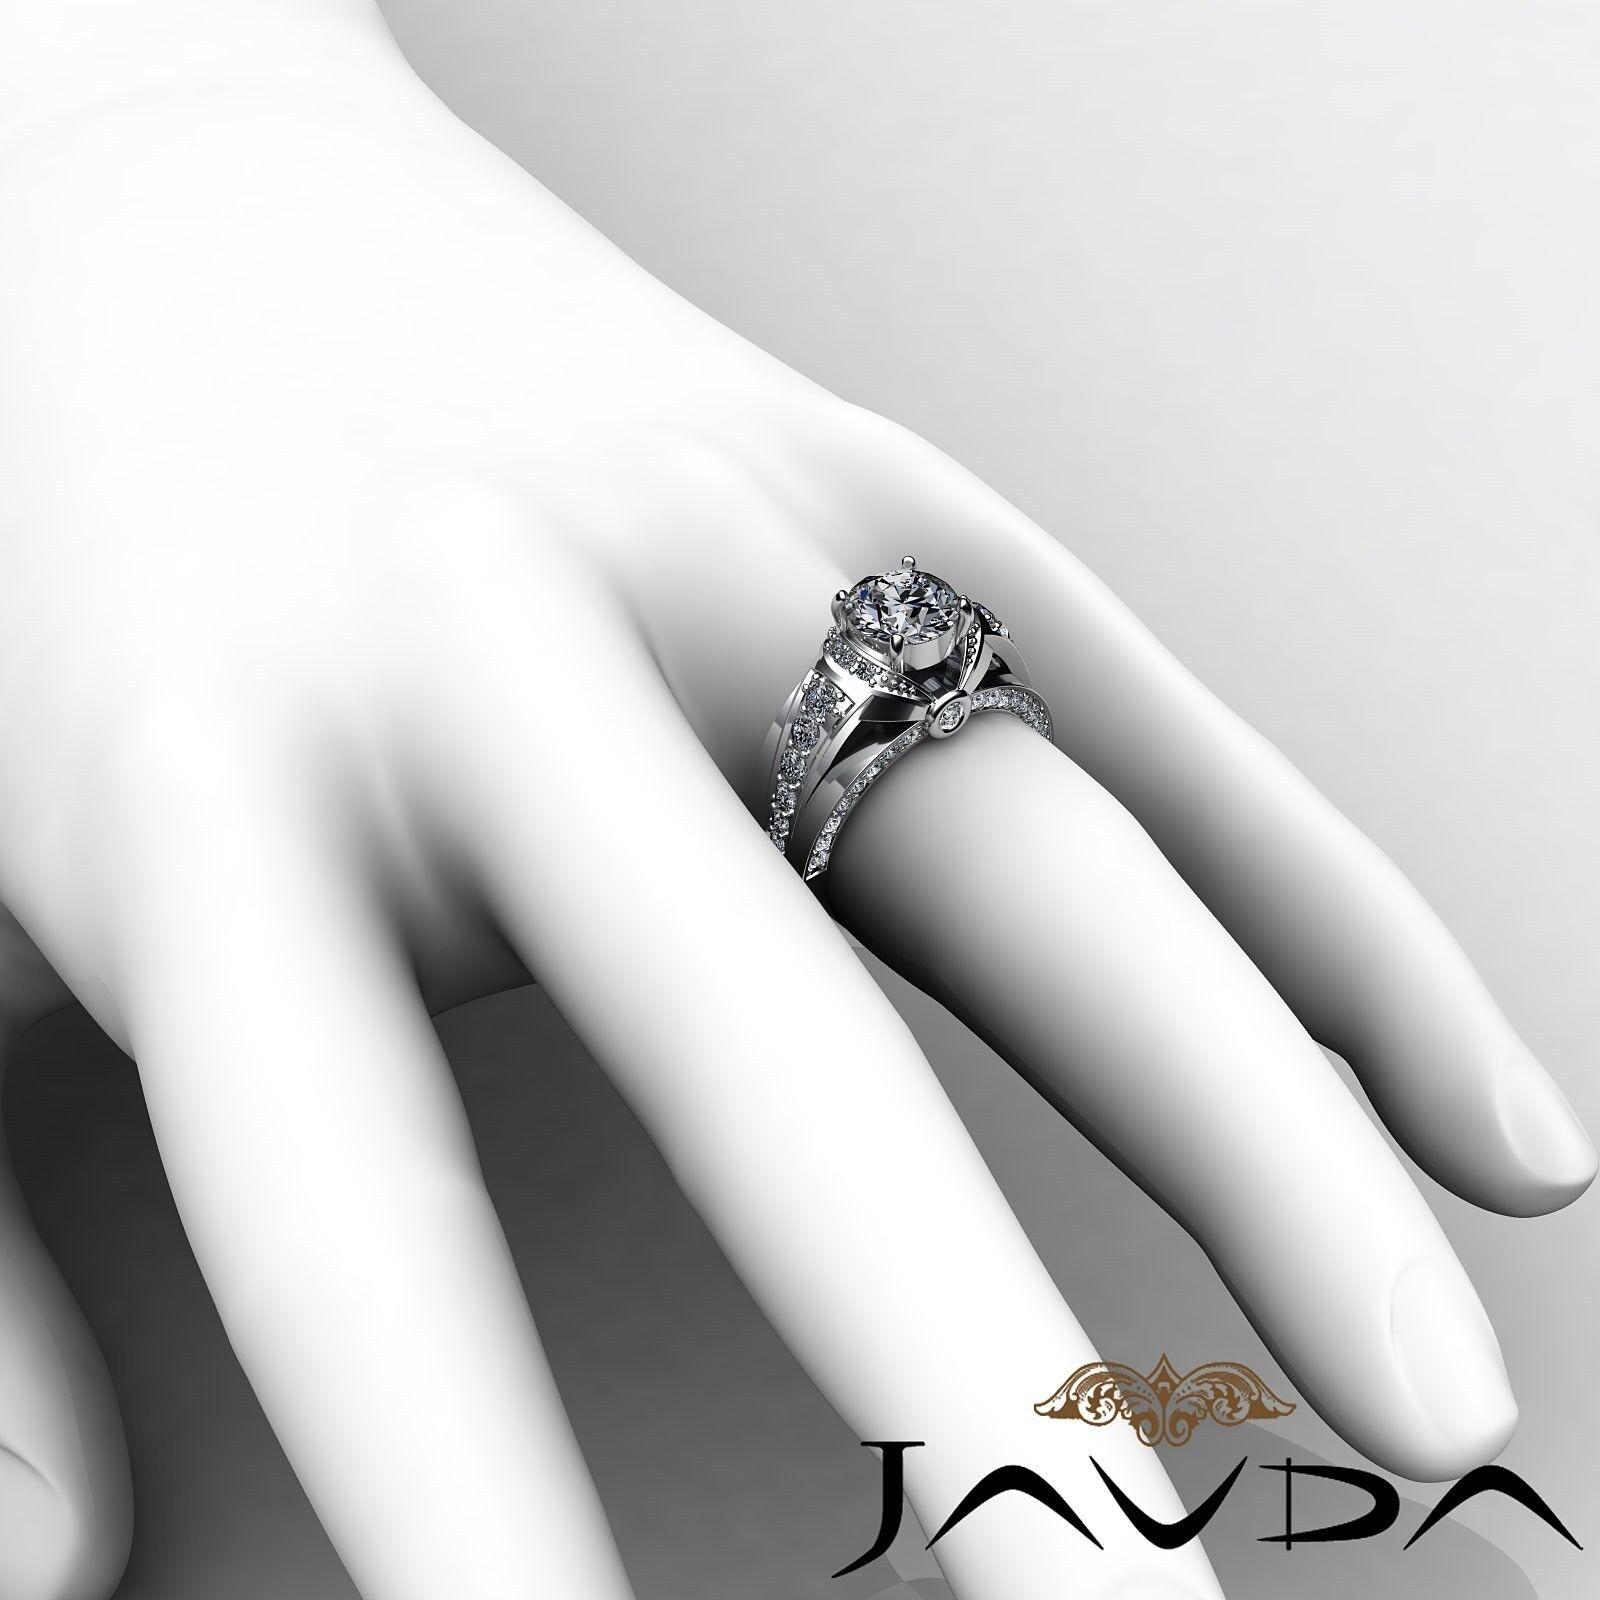 1.7ct Knot Classic Sidestone Round Diamond Engagement Ring GIA H-VVS2 White Gold 5